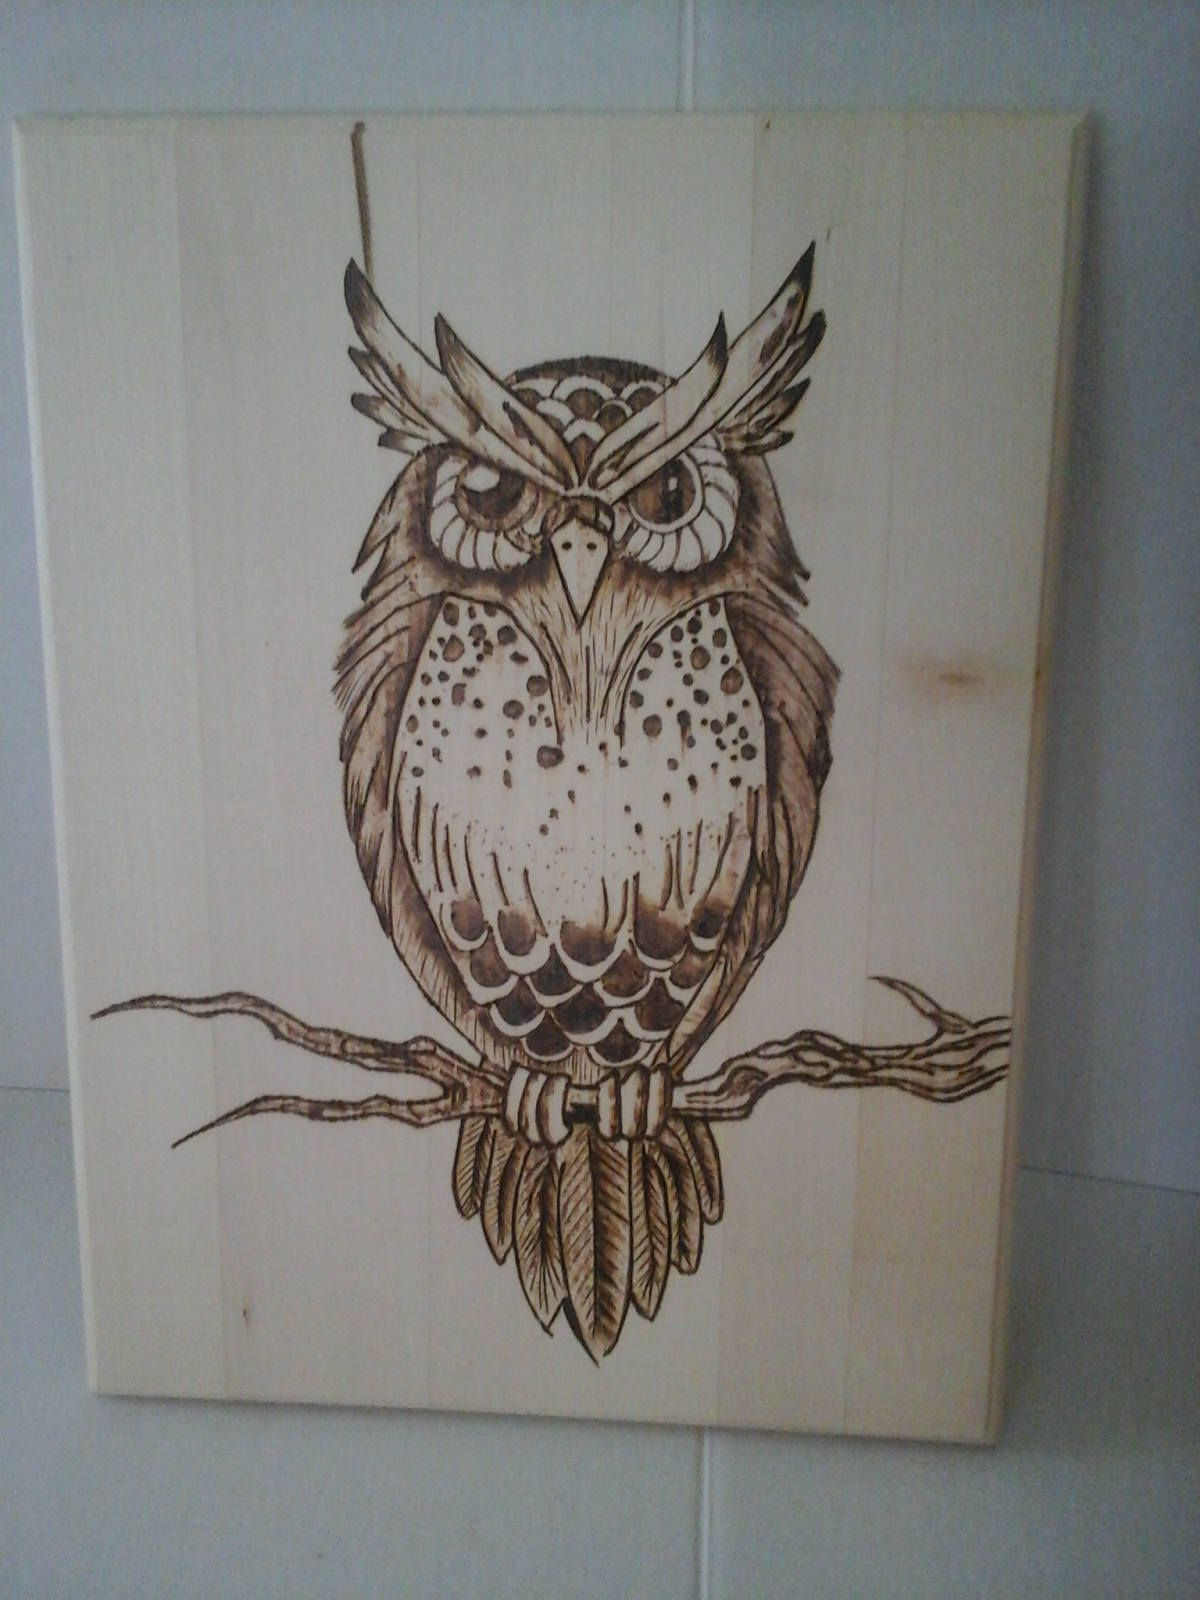 Items similar to Wood Burned Hoot Owl Art on Etsy